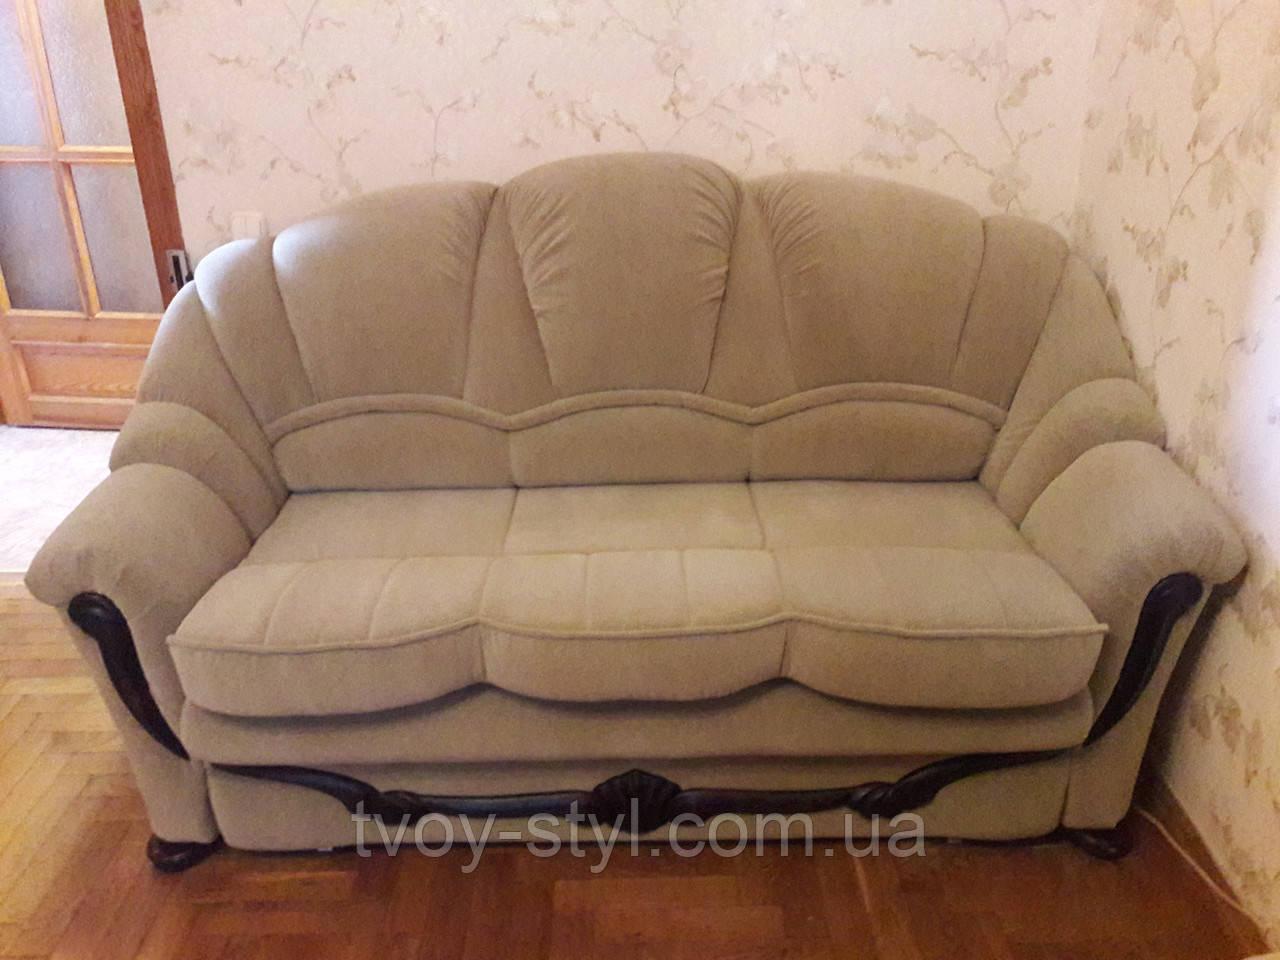 Обивка мягкой мебели Днепр